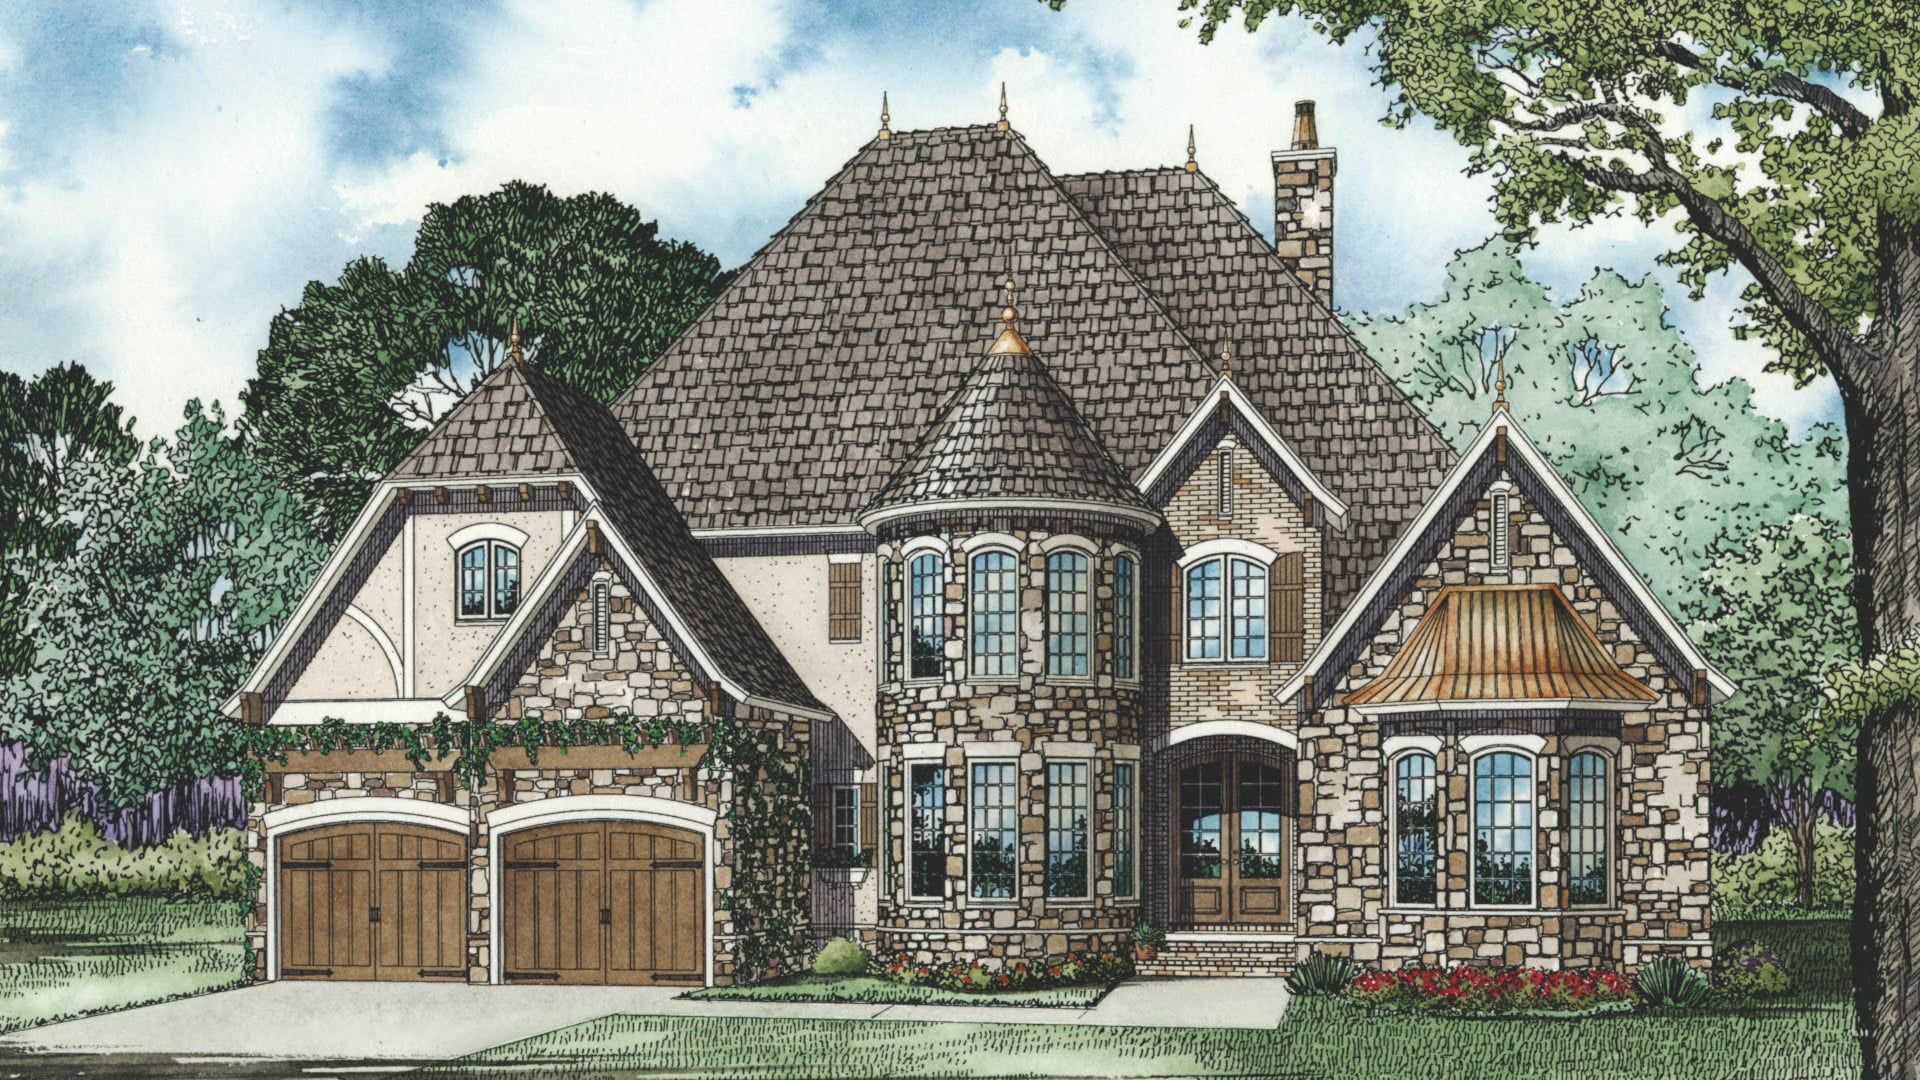 House plan ndg 1214 stone castle visual open house